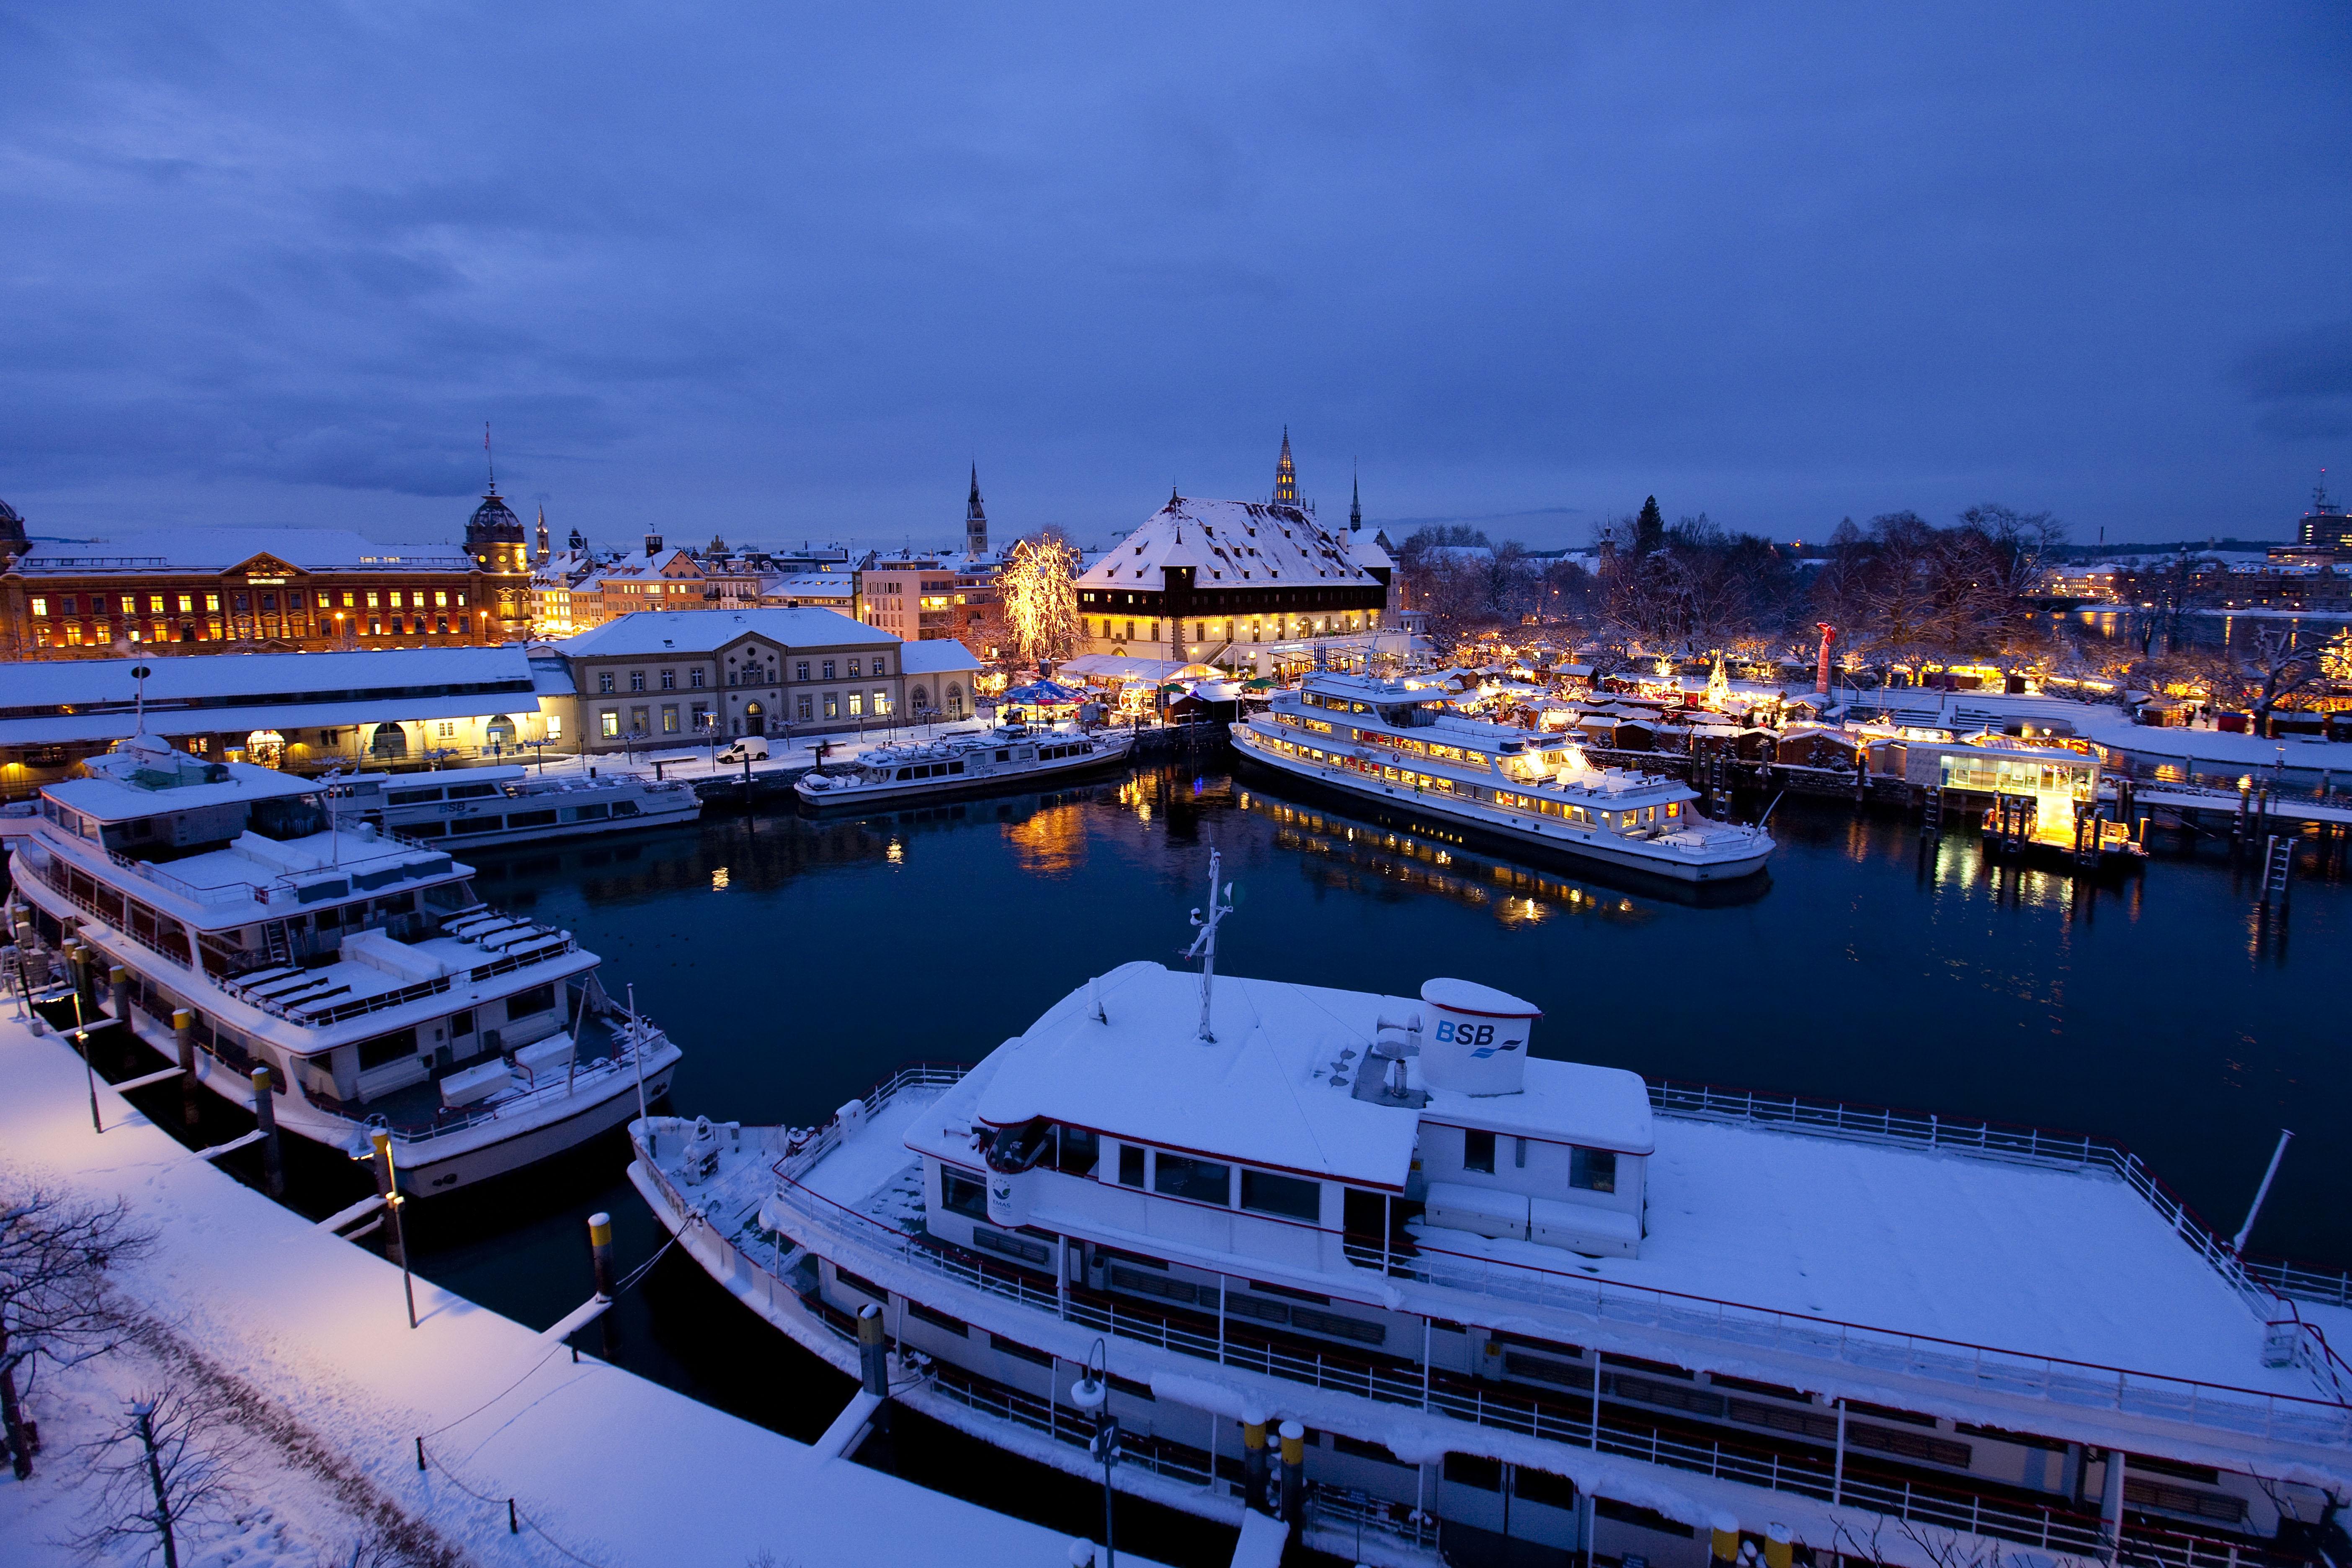 K1-4 Konstanzer Hafen Winter_Men